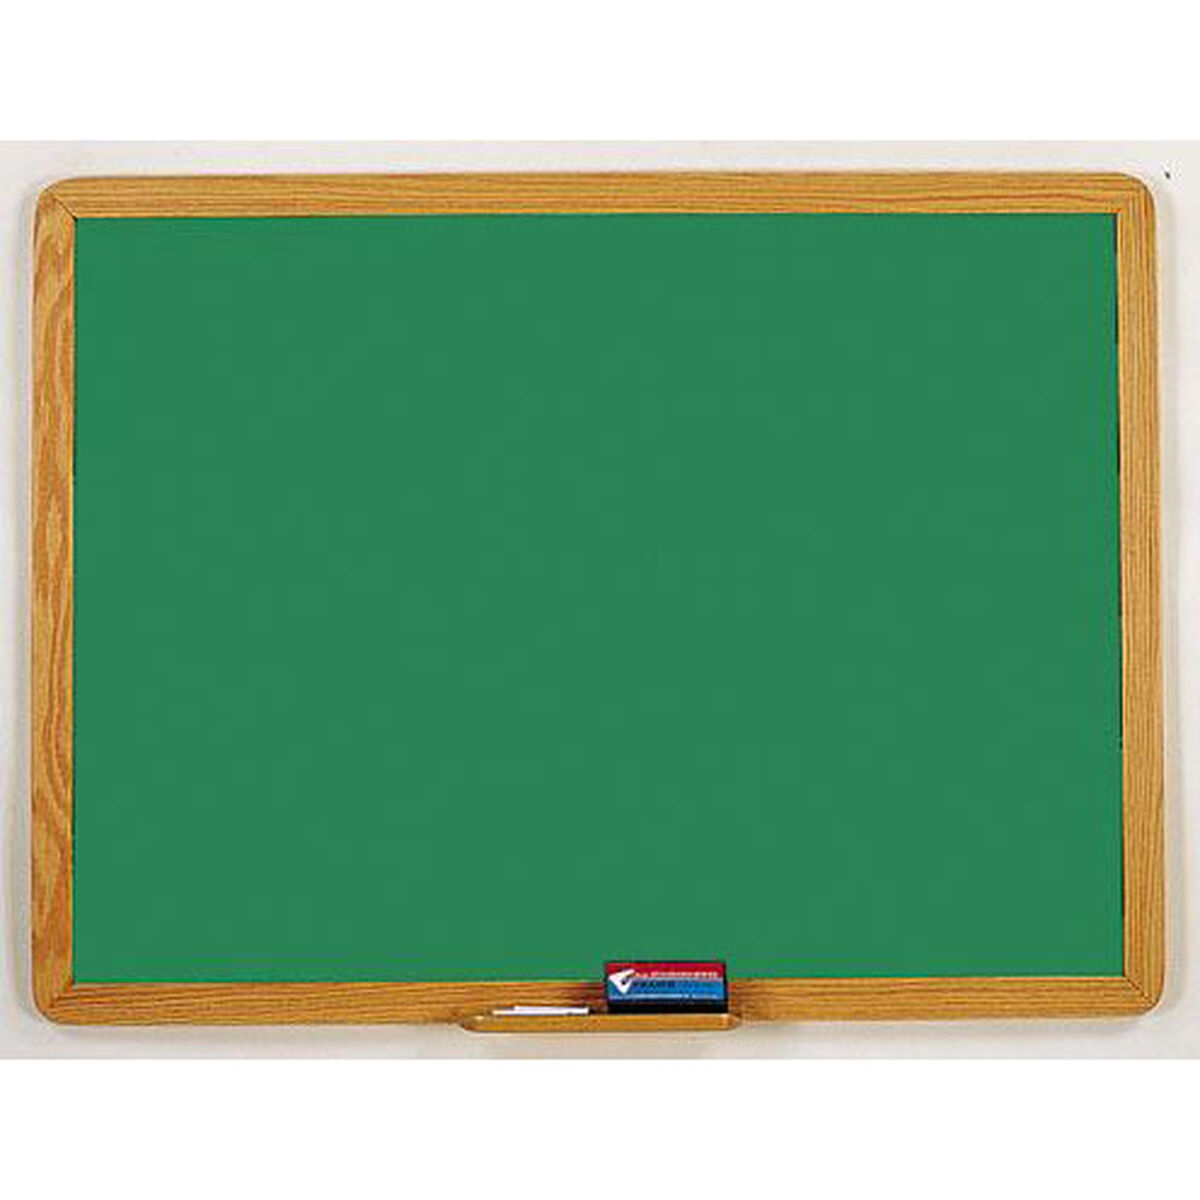 Series Chalkboard V RestaurantFurnitureLesscom - Pool table chalk board